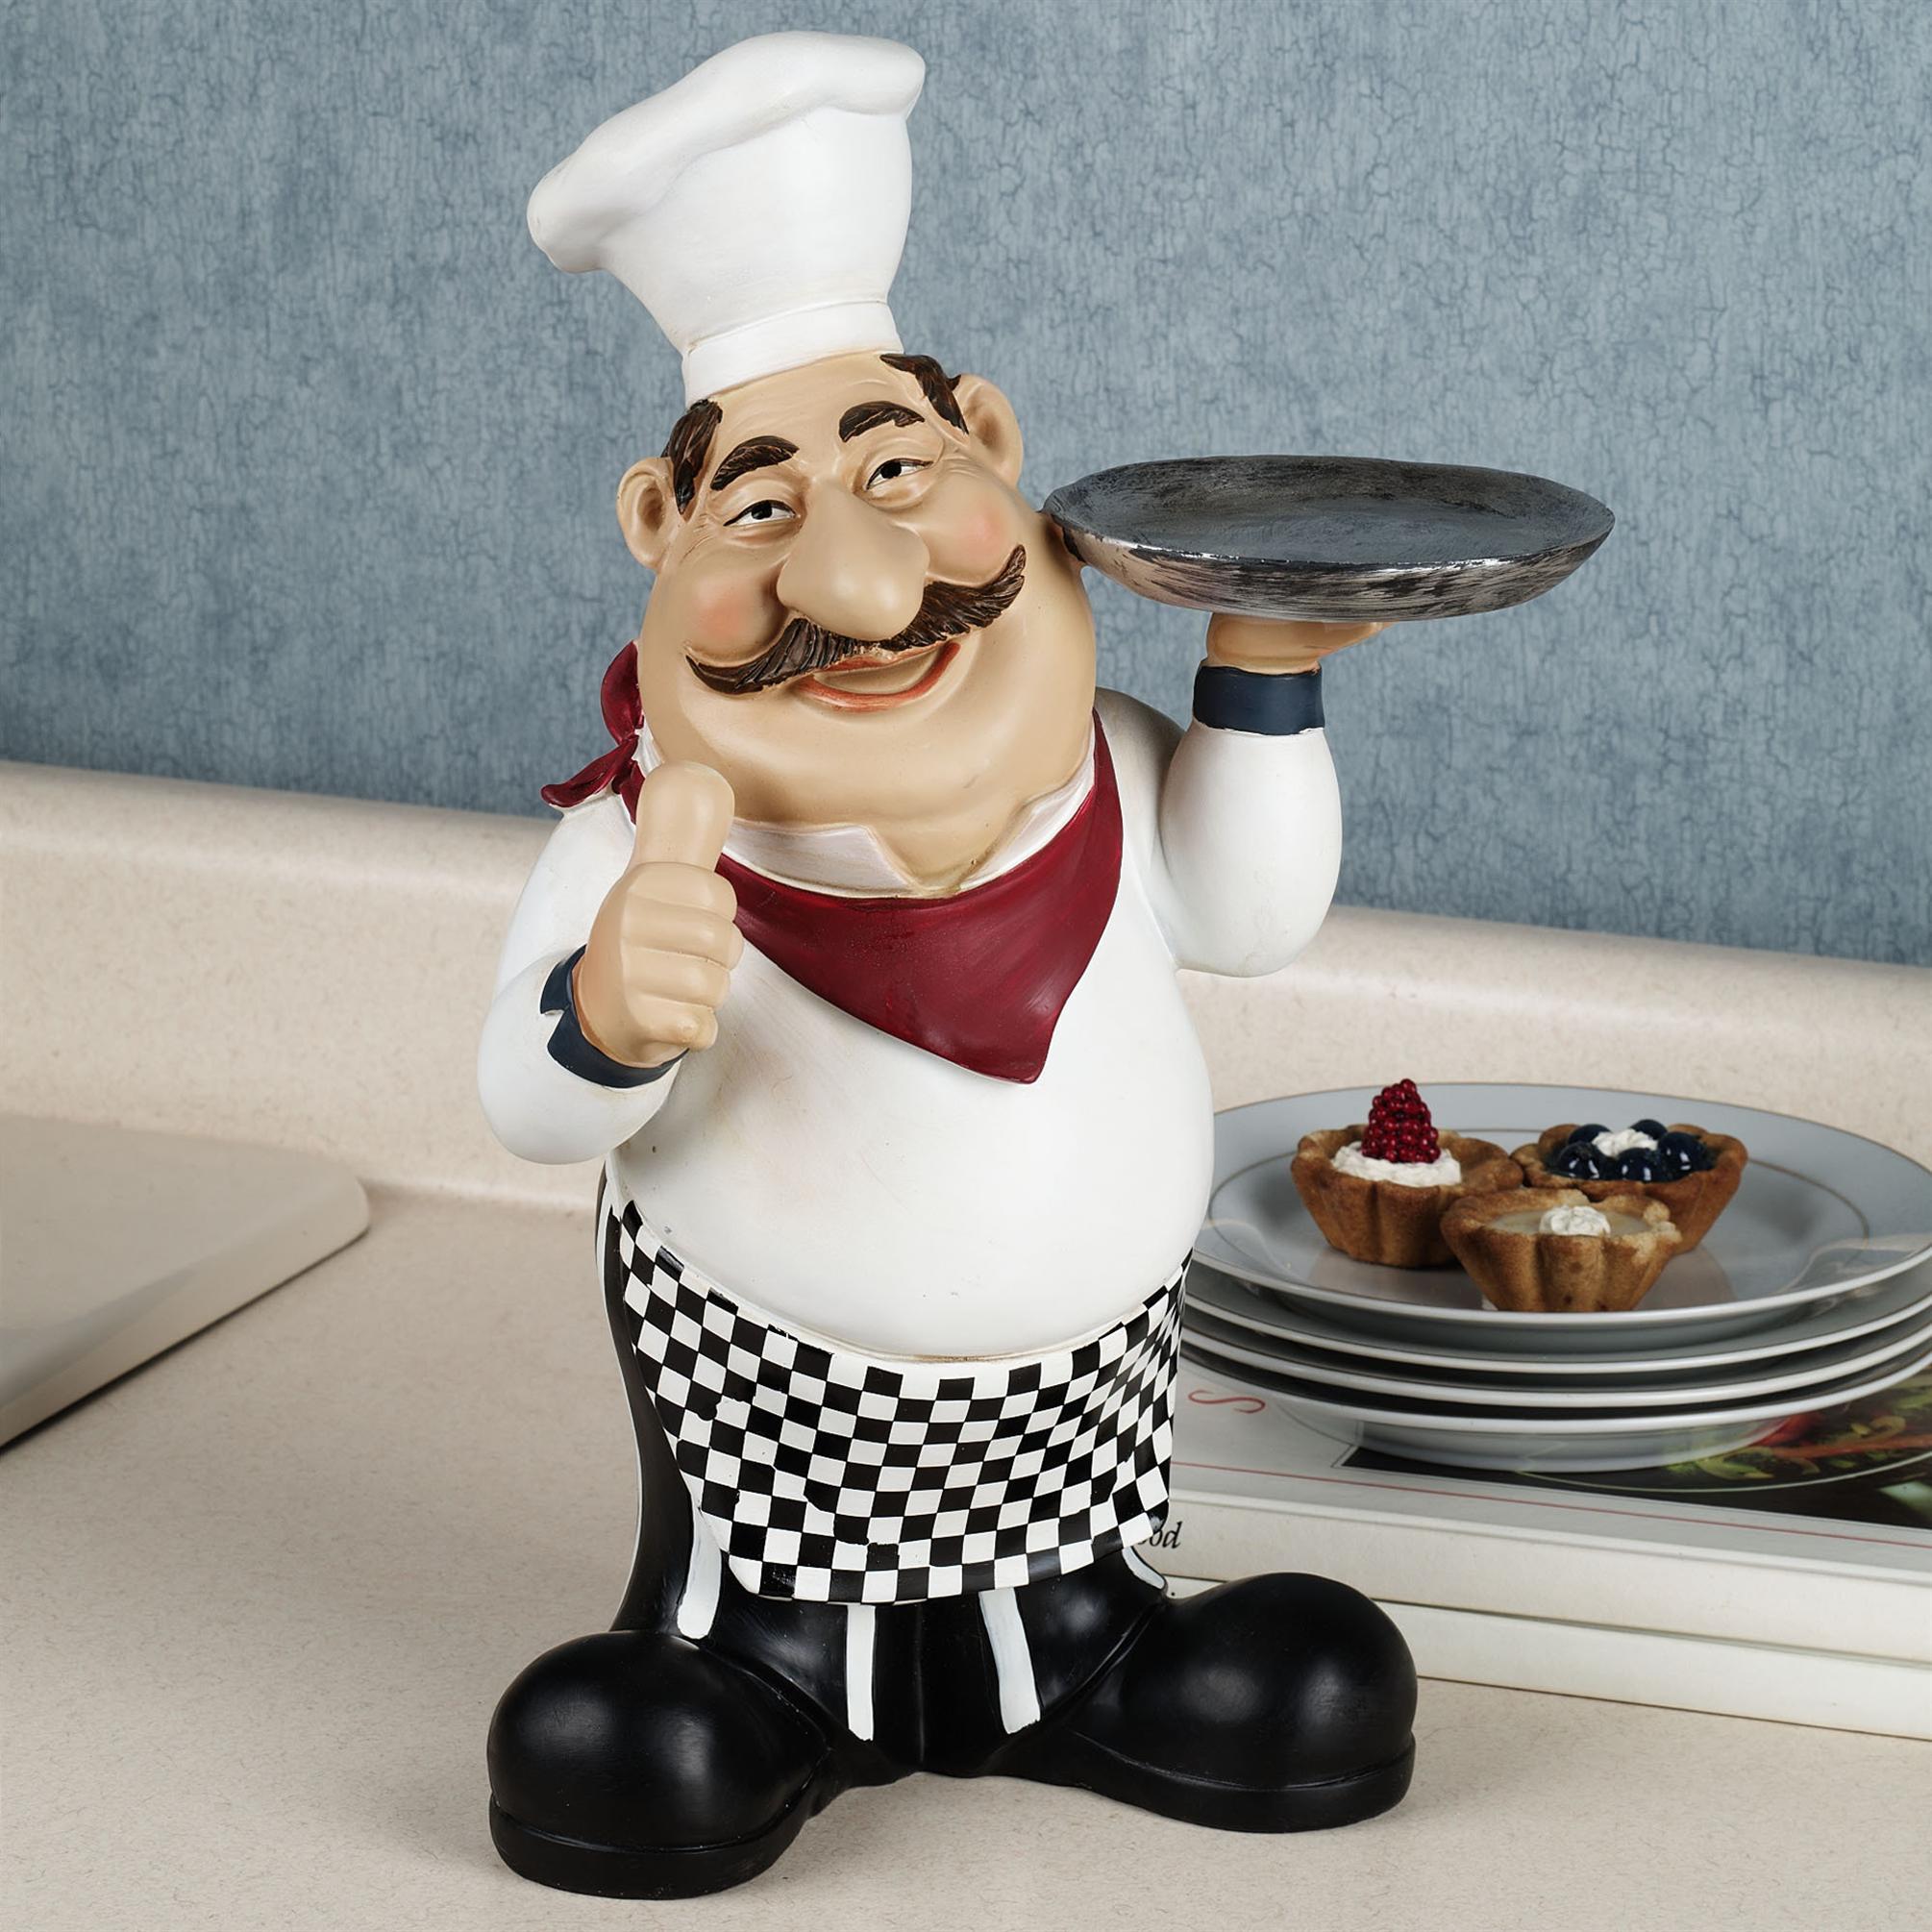 Free Download Fat Chef Kitchen Decor 2010x2010 For Your Desktop Mobile Tablet Explore 48 Wallpaper Border Man Italian